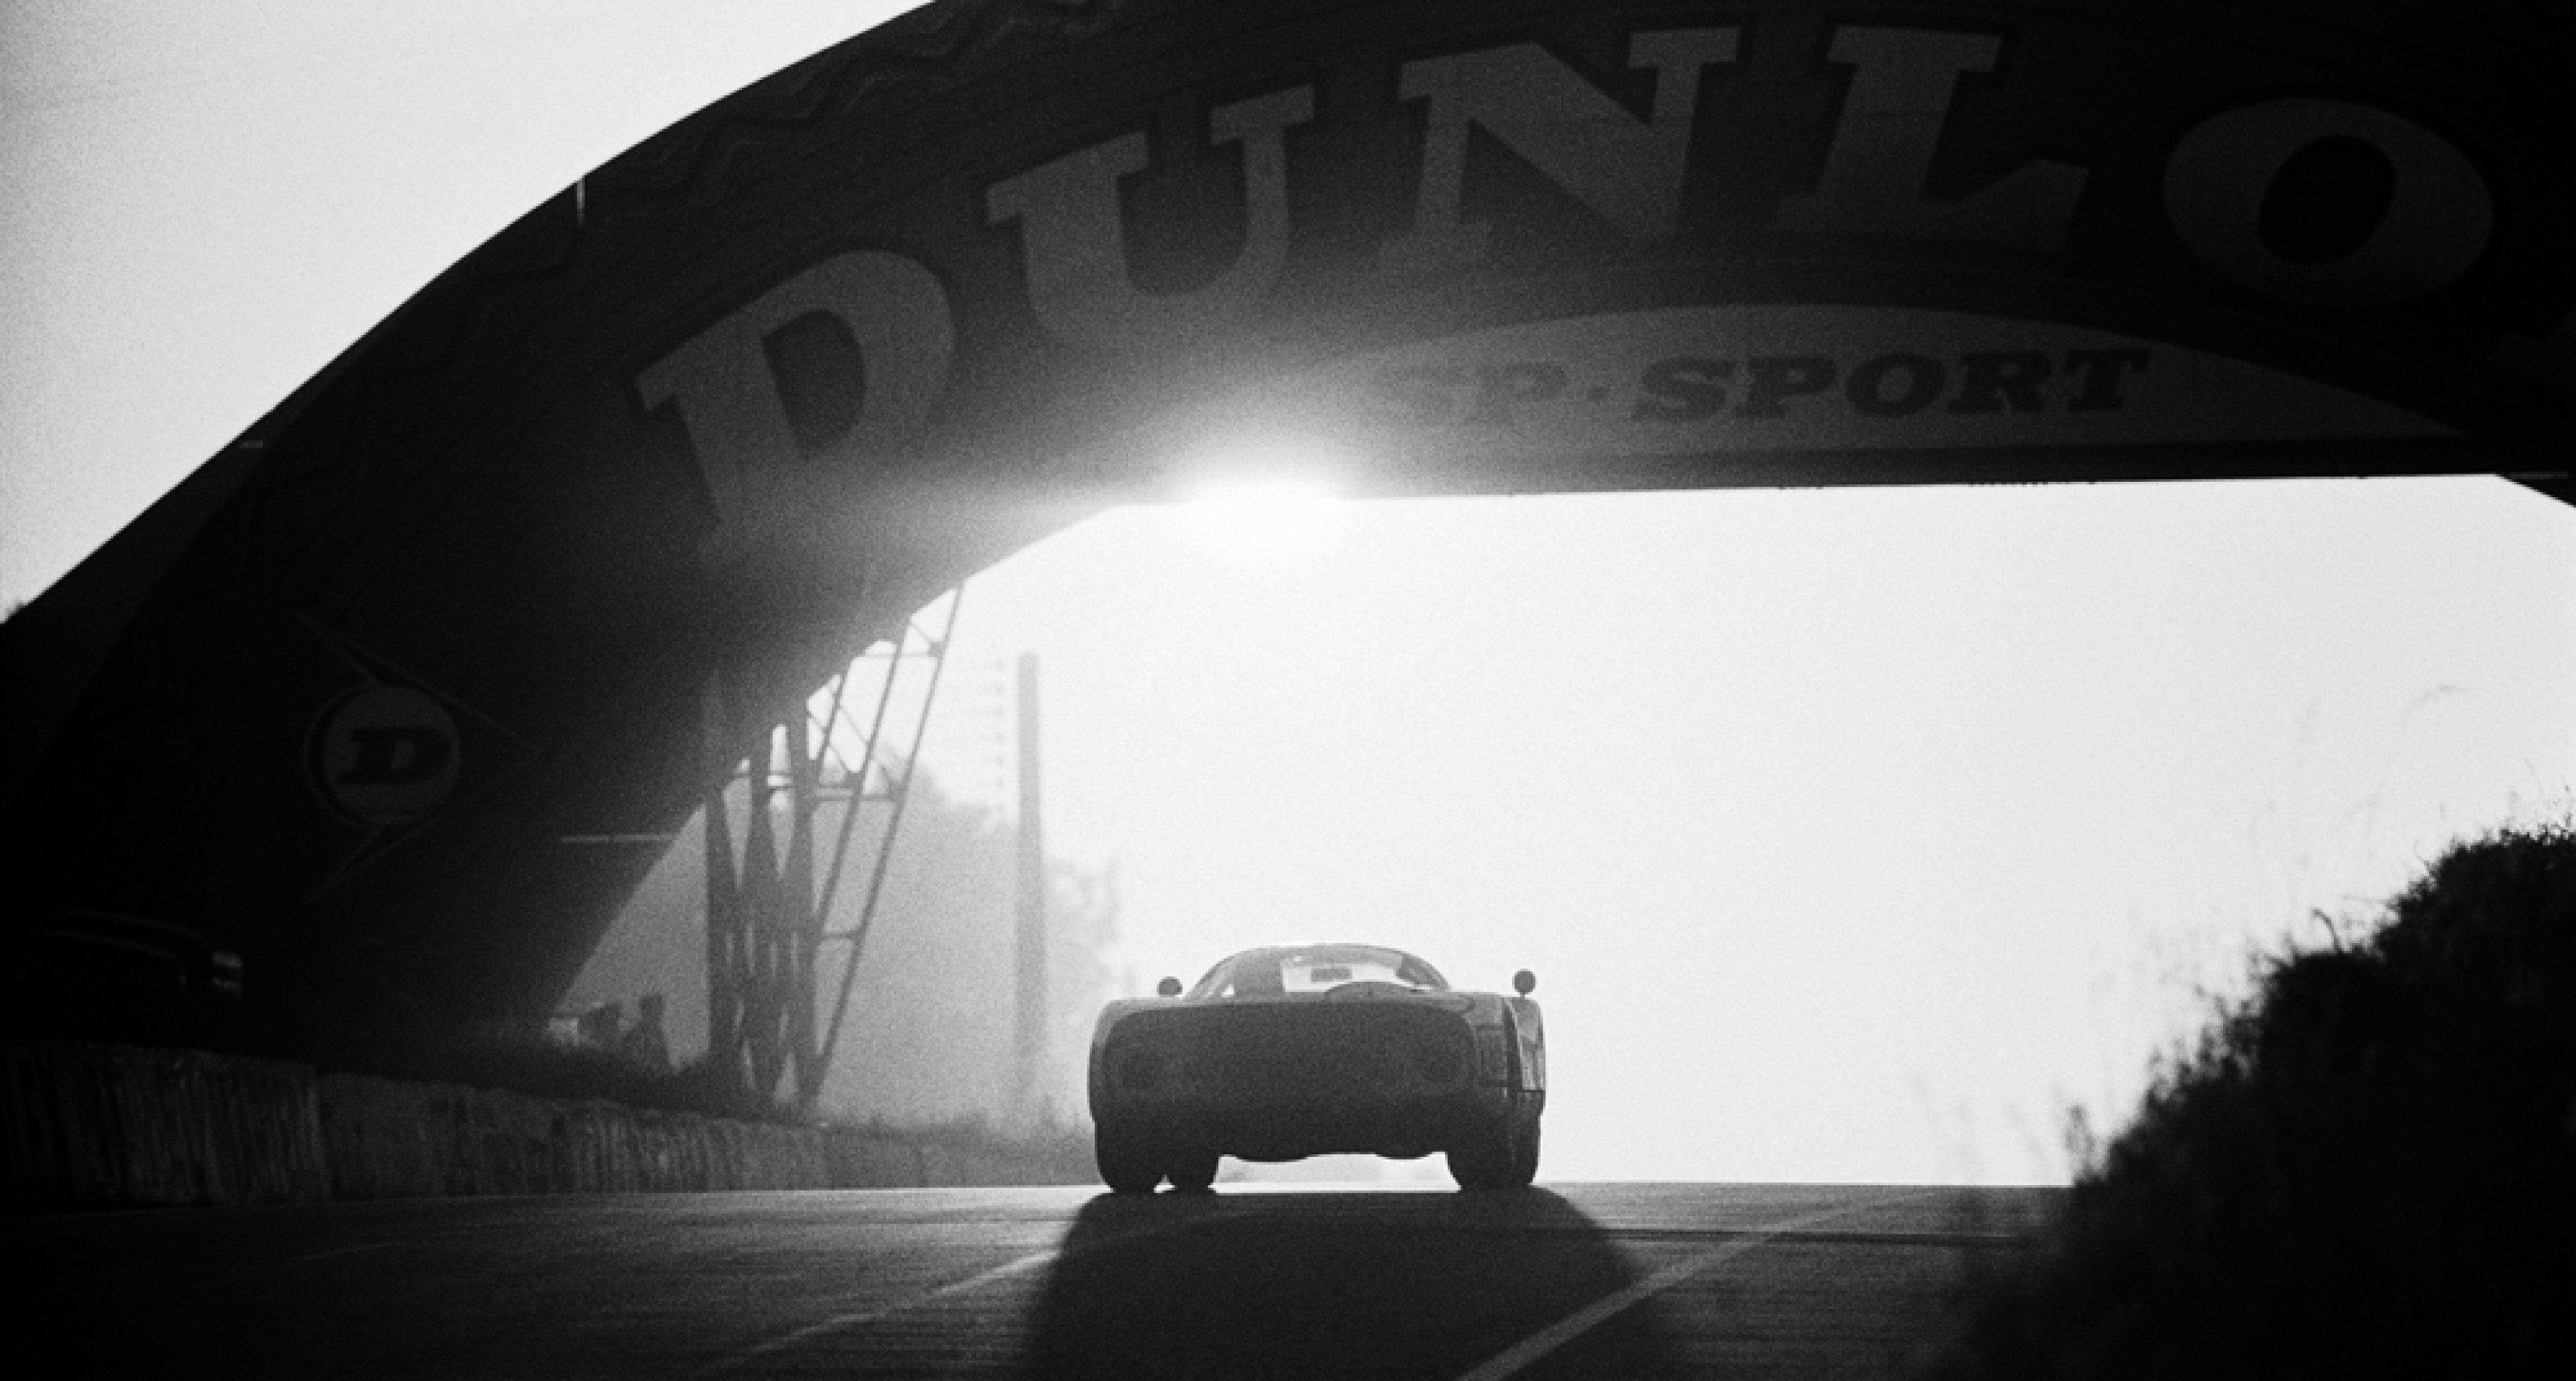 France, Le Mans, 10 June 1967. (Photo by Rainer W. Schlegelmilch/Getty Images)